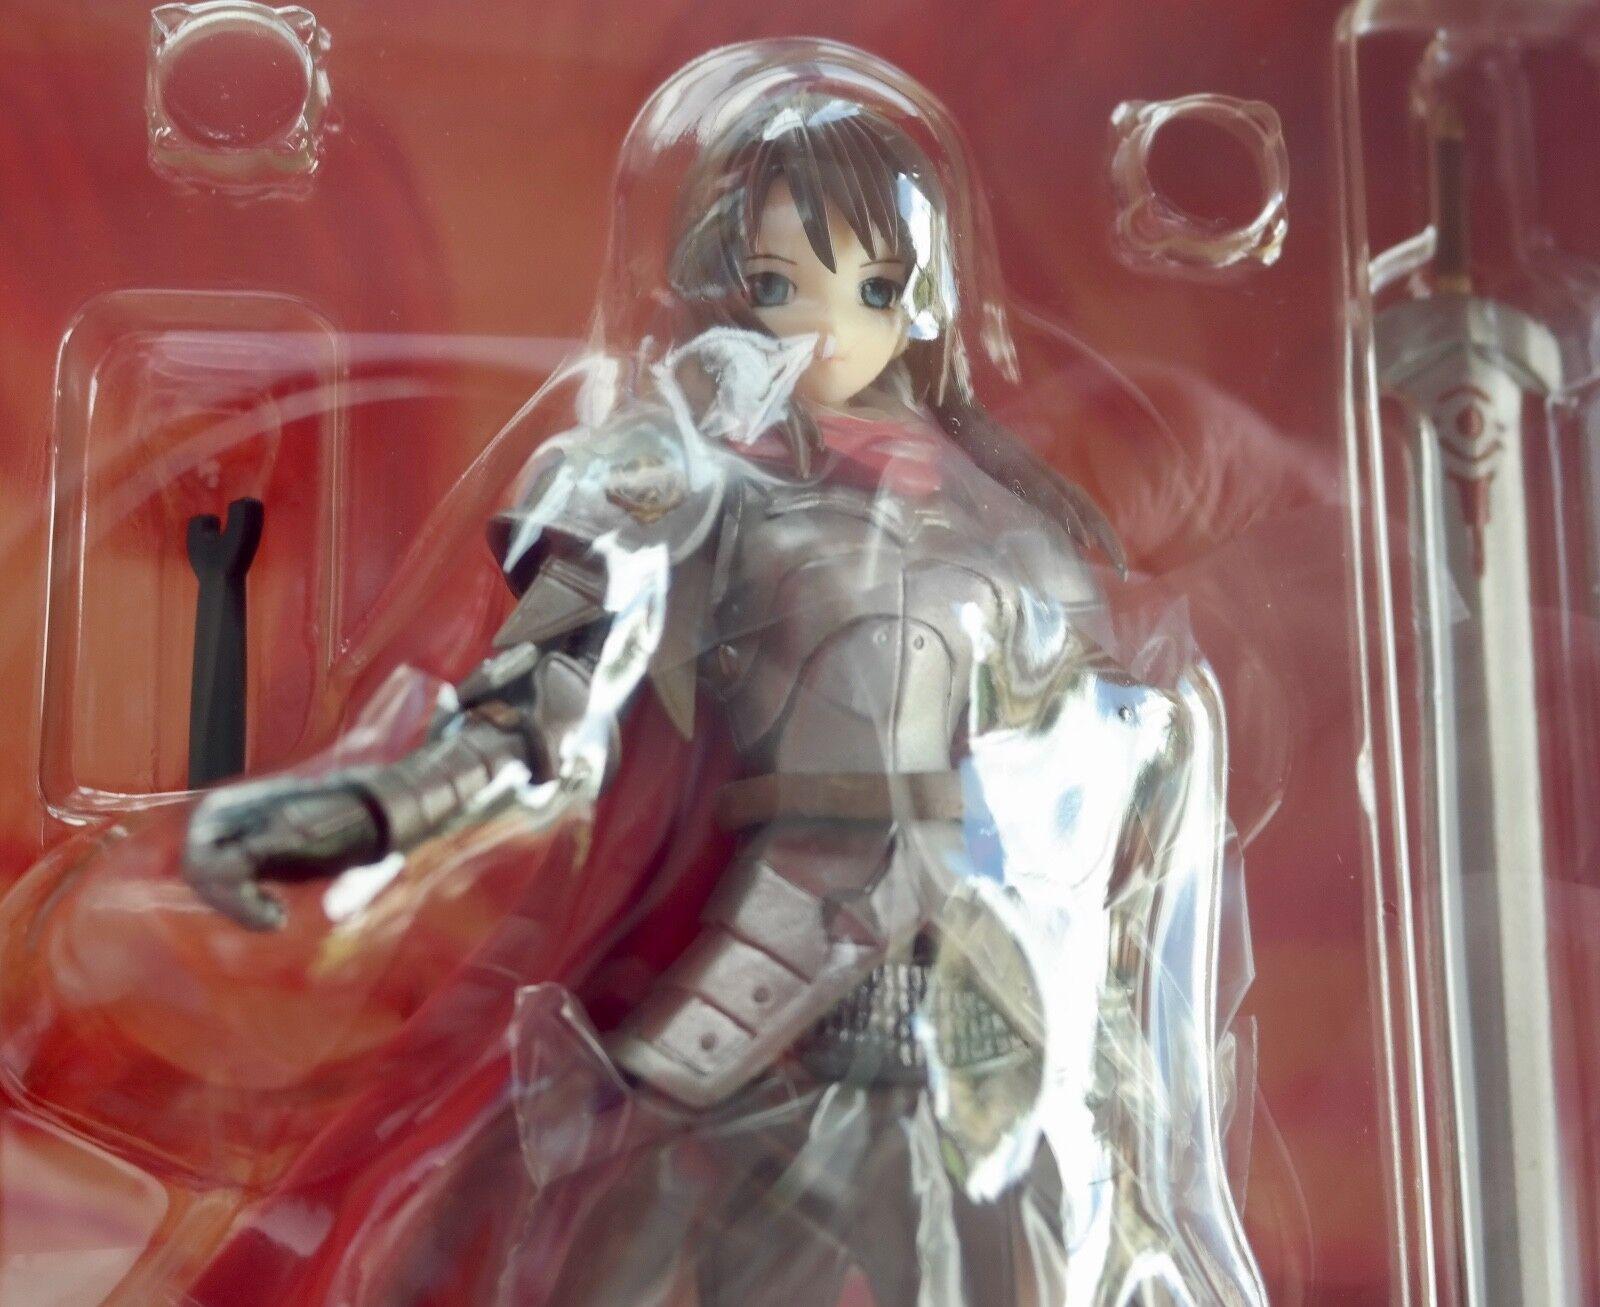 Generation of Chaos IV Clain Clain Clain Clain Figure   MIB   Factory Sealed   Playstation 7ef28e